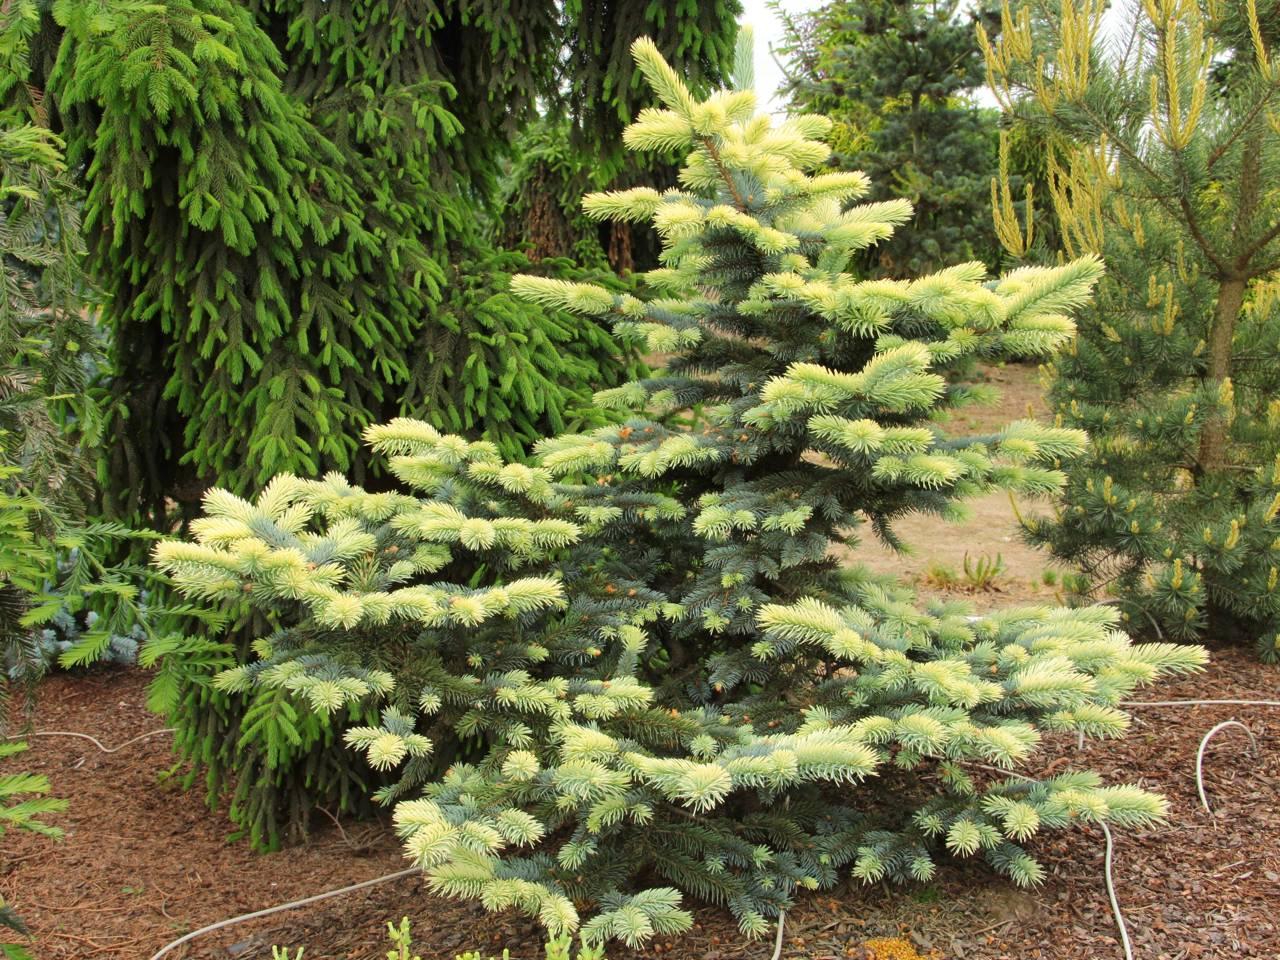 Picea pungens Bialobok yellow conifer evergreen